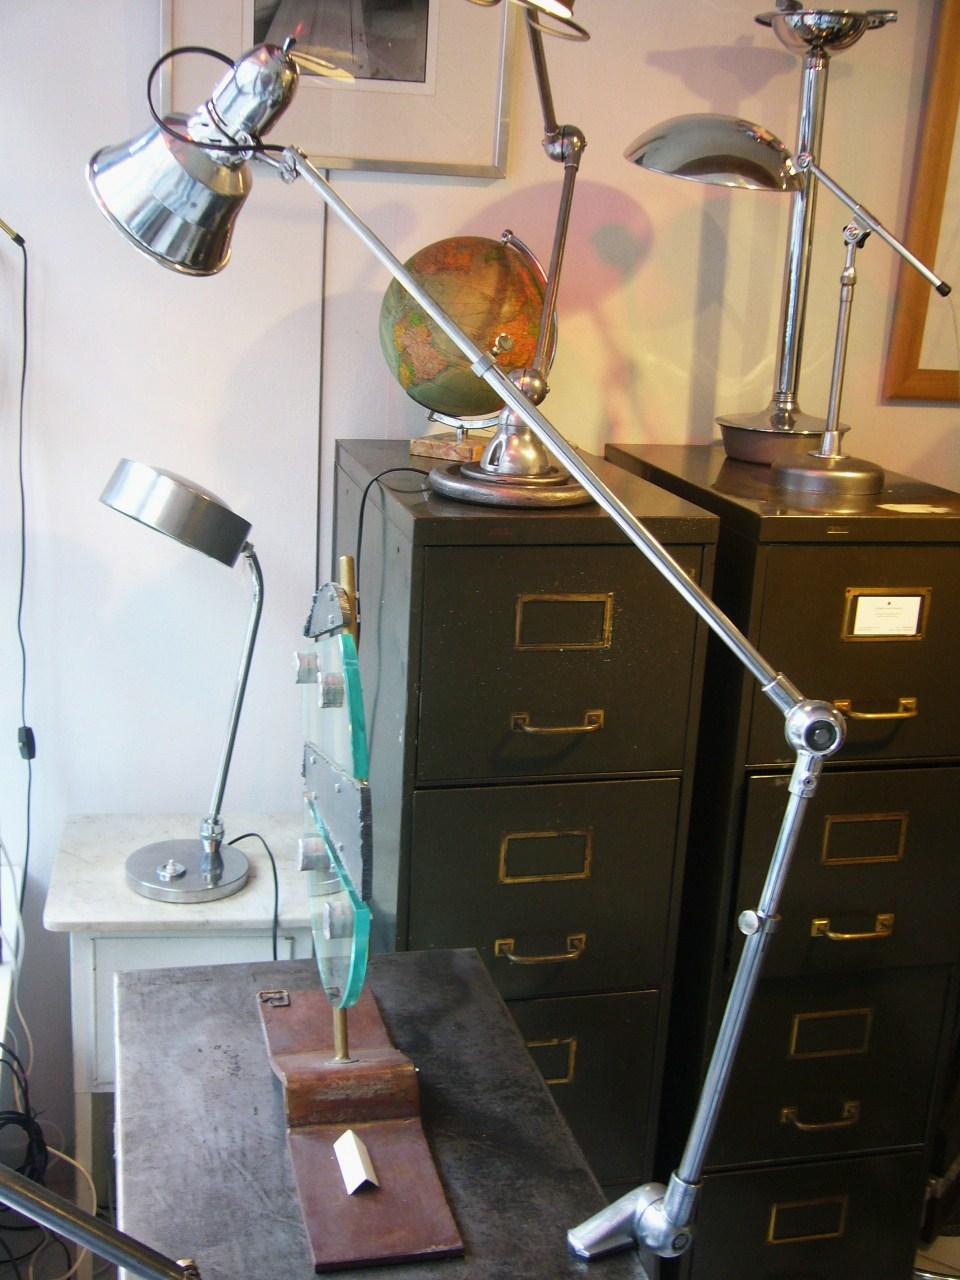 Lampe Lumina At Bertrand Legrix Antiquites Du Xxe Si Cle